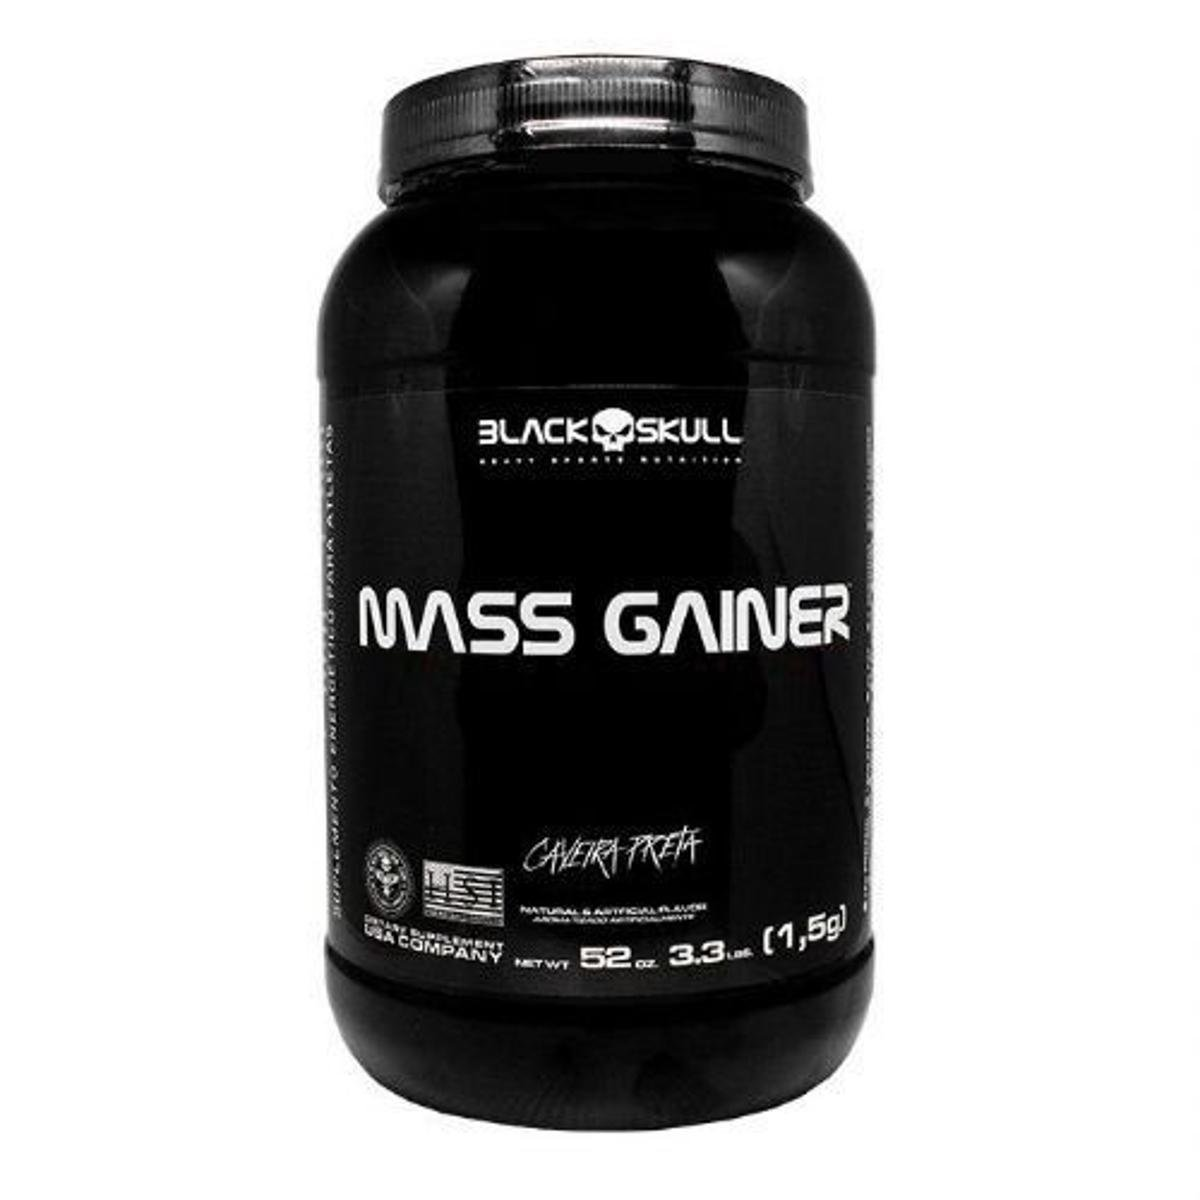 ca894c7cc6 Mass Gainer Black Skull 3.3 Lbs